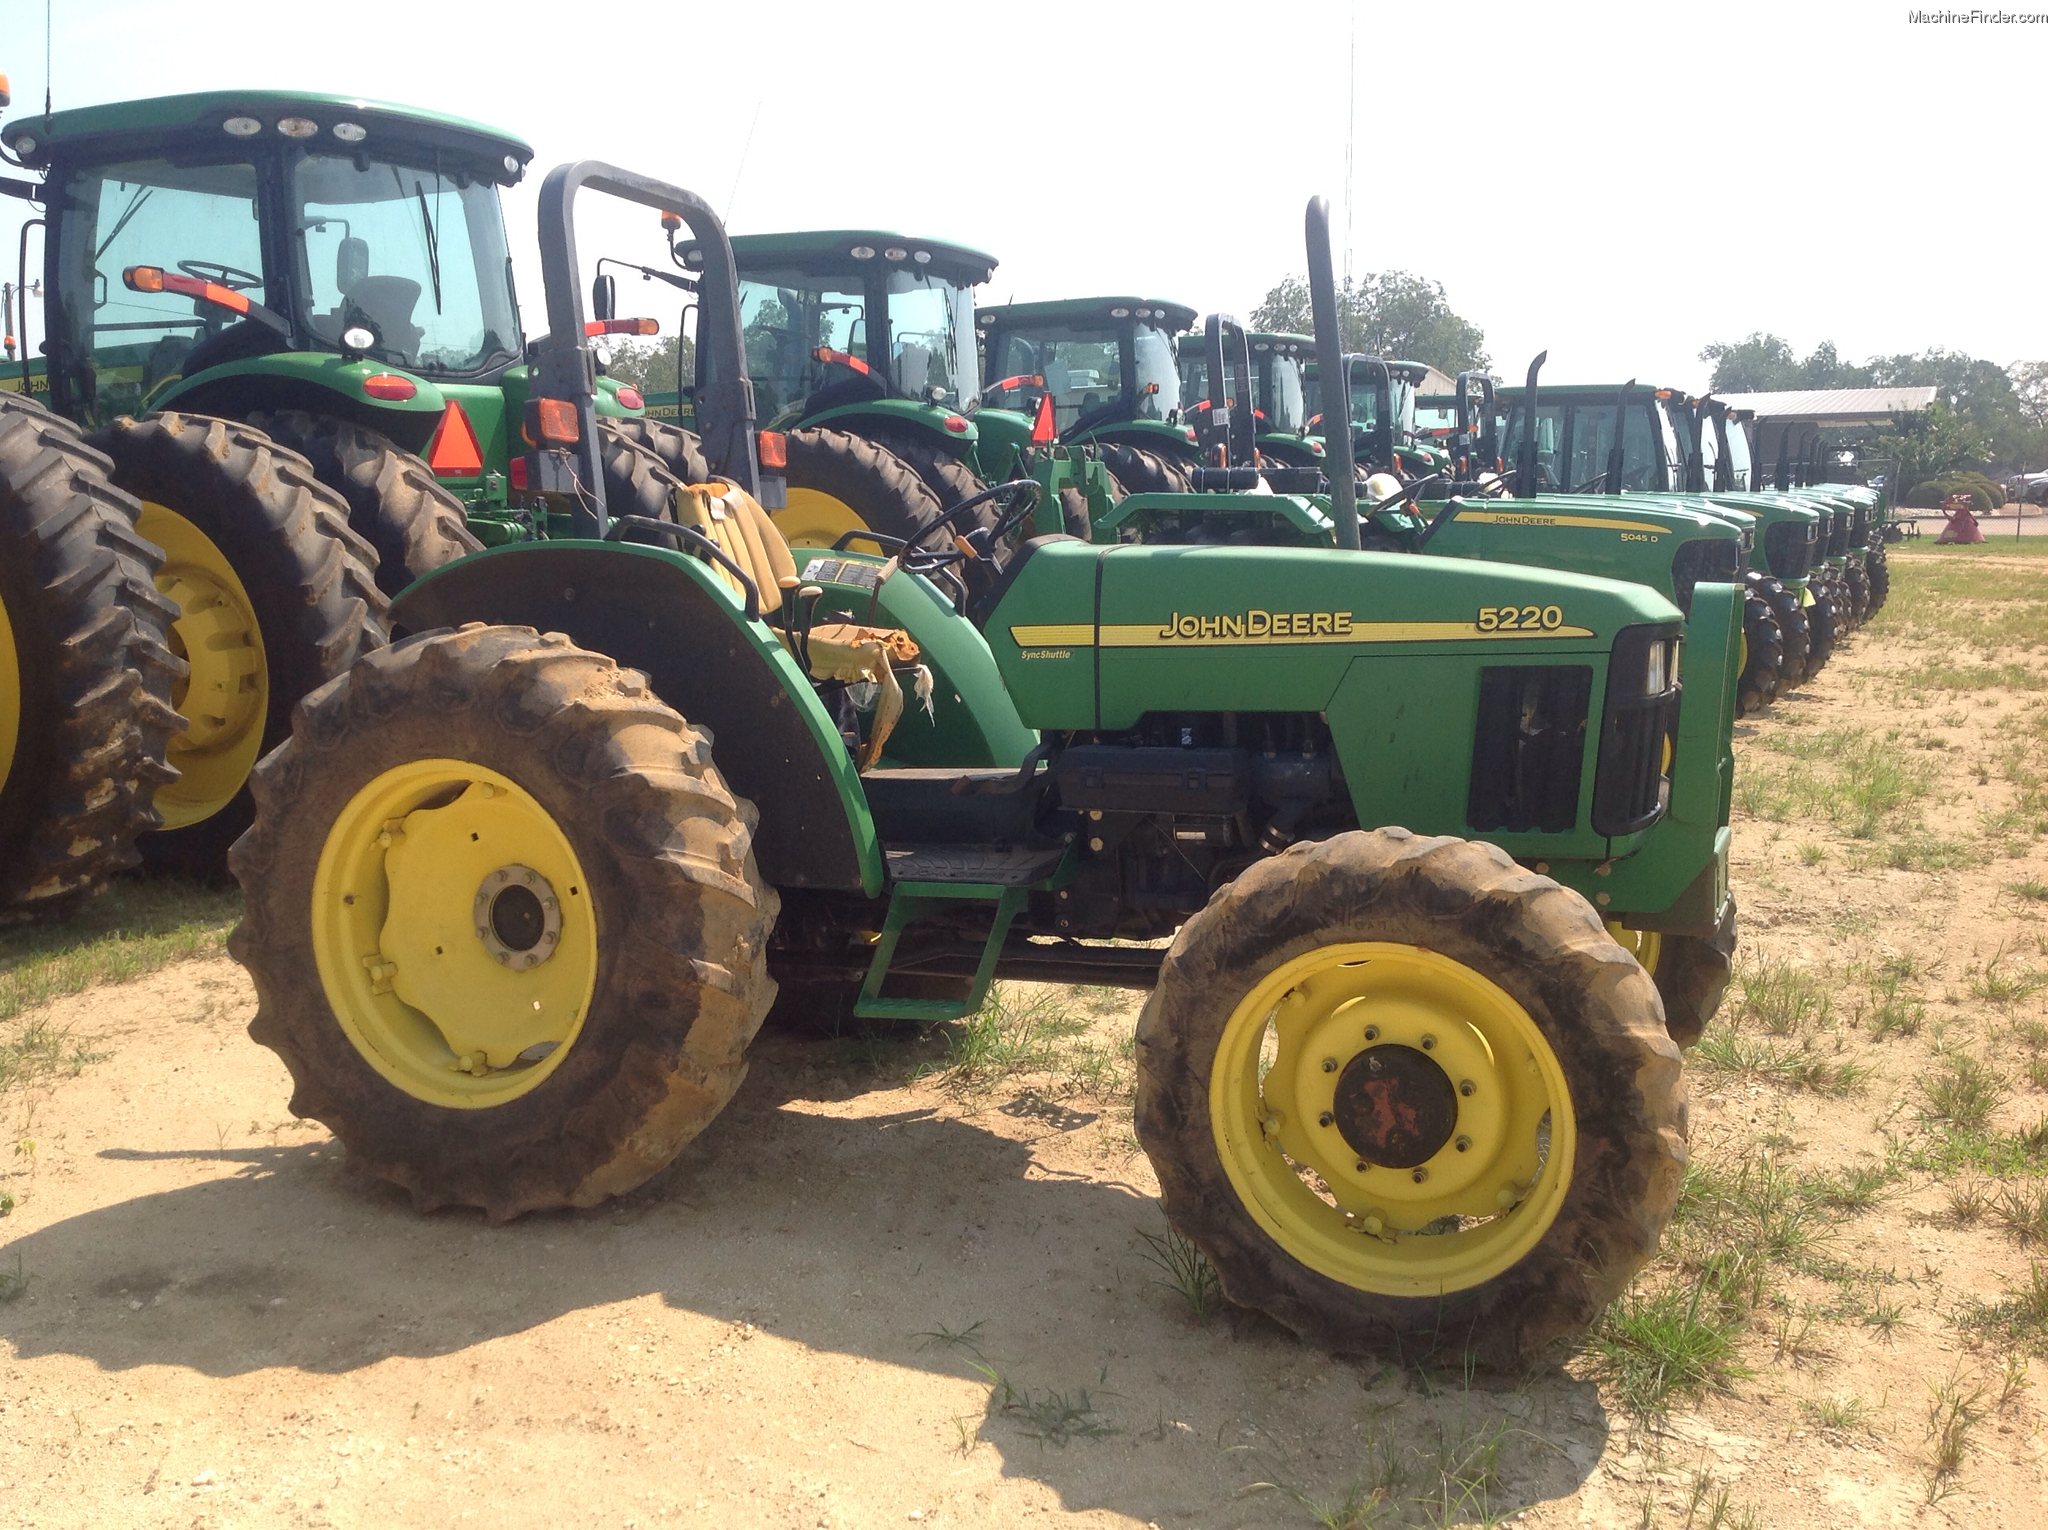 2001 John Deere 5220 Tractors - Compact (1-40hp.) - John ...